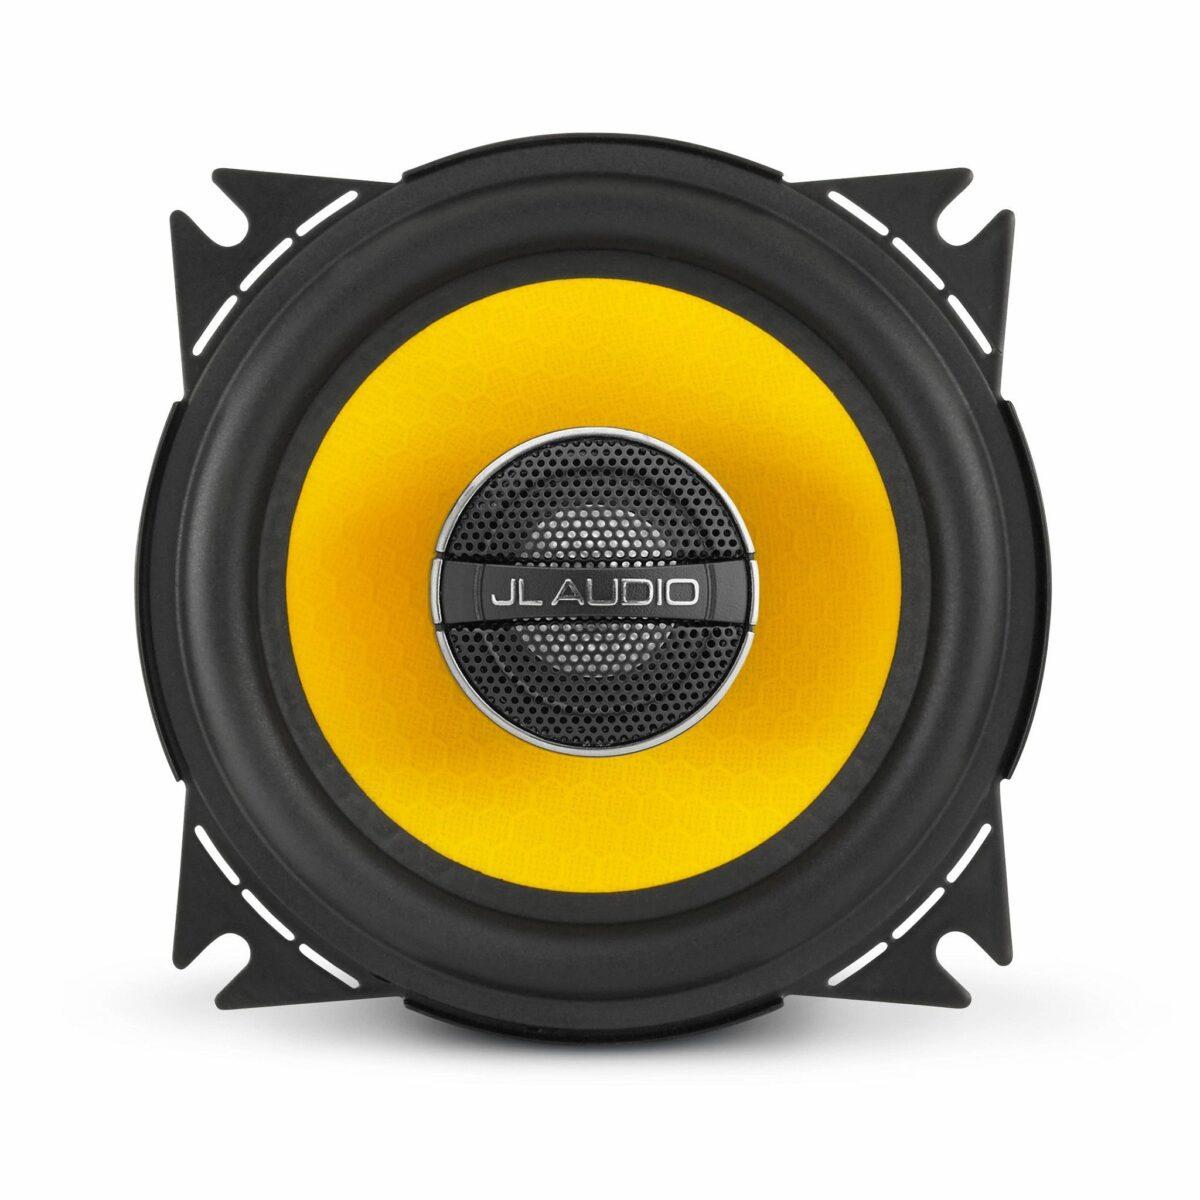 Jl Audio Jl Audio C1 400x Foh Coaxial Speakers Life Style Store Sydney Nsw